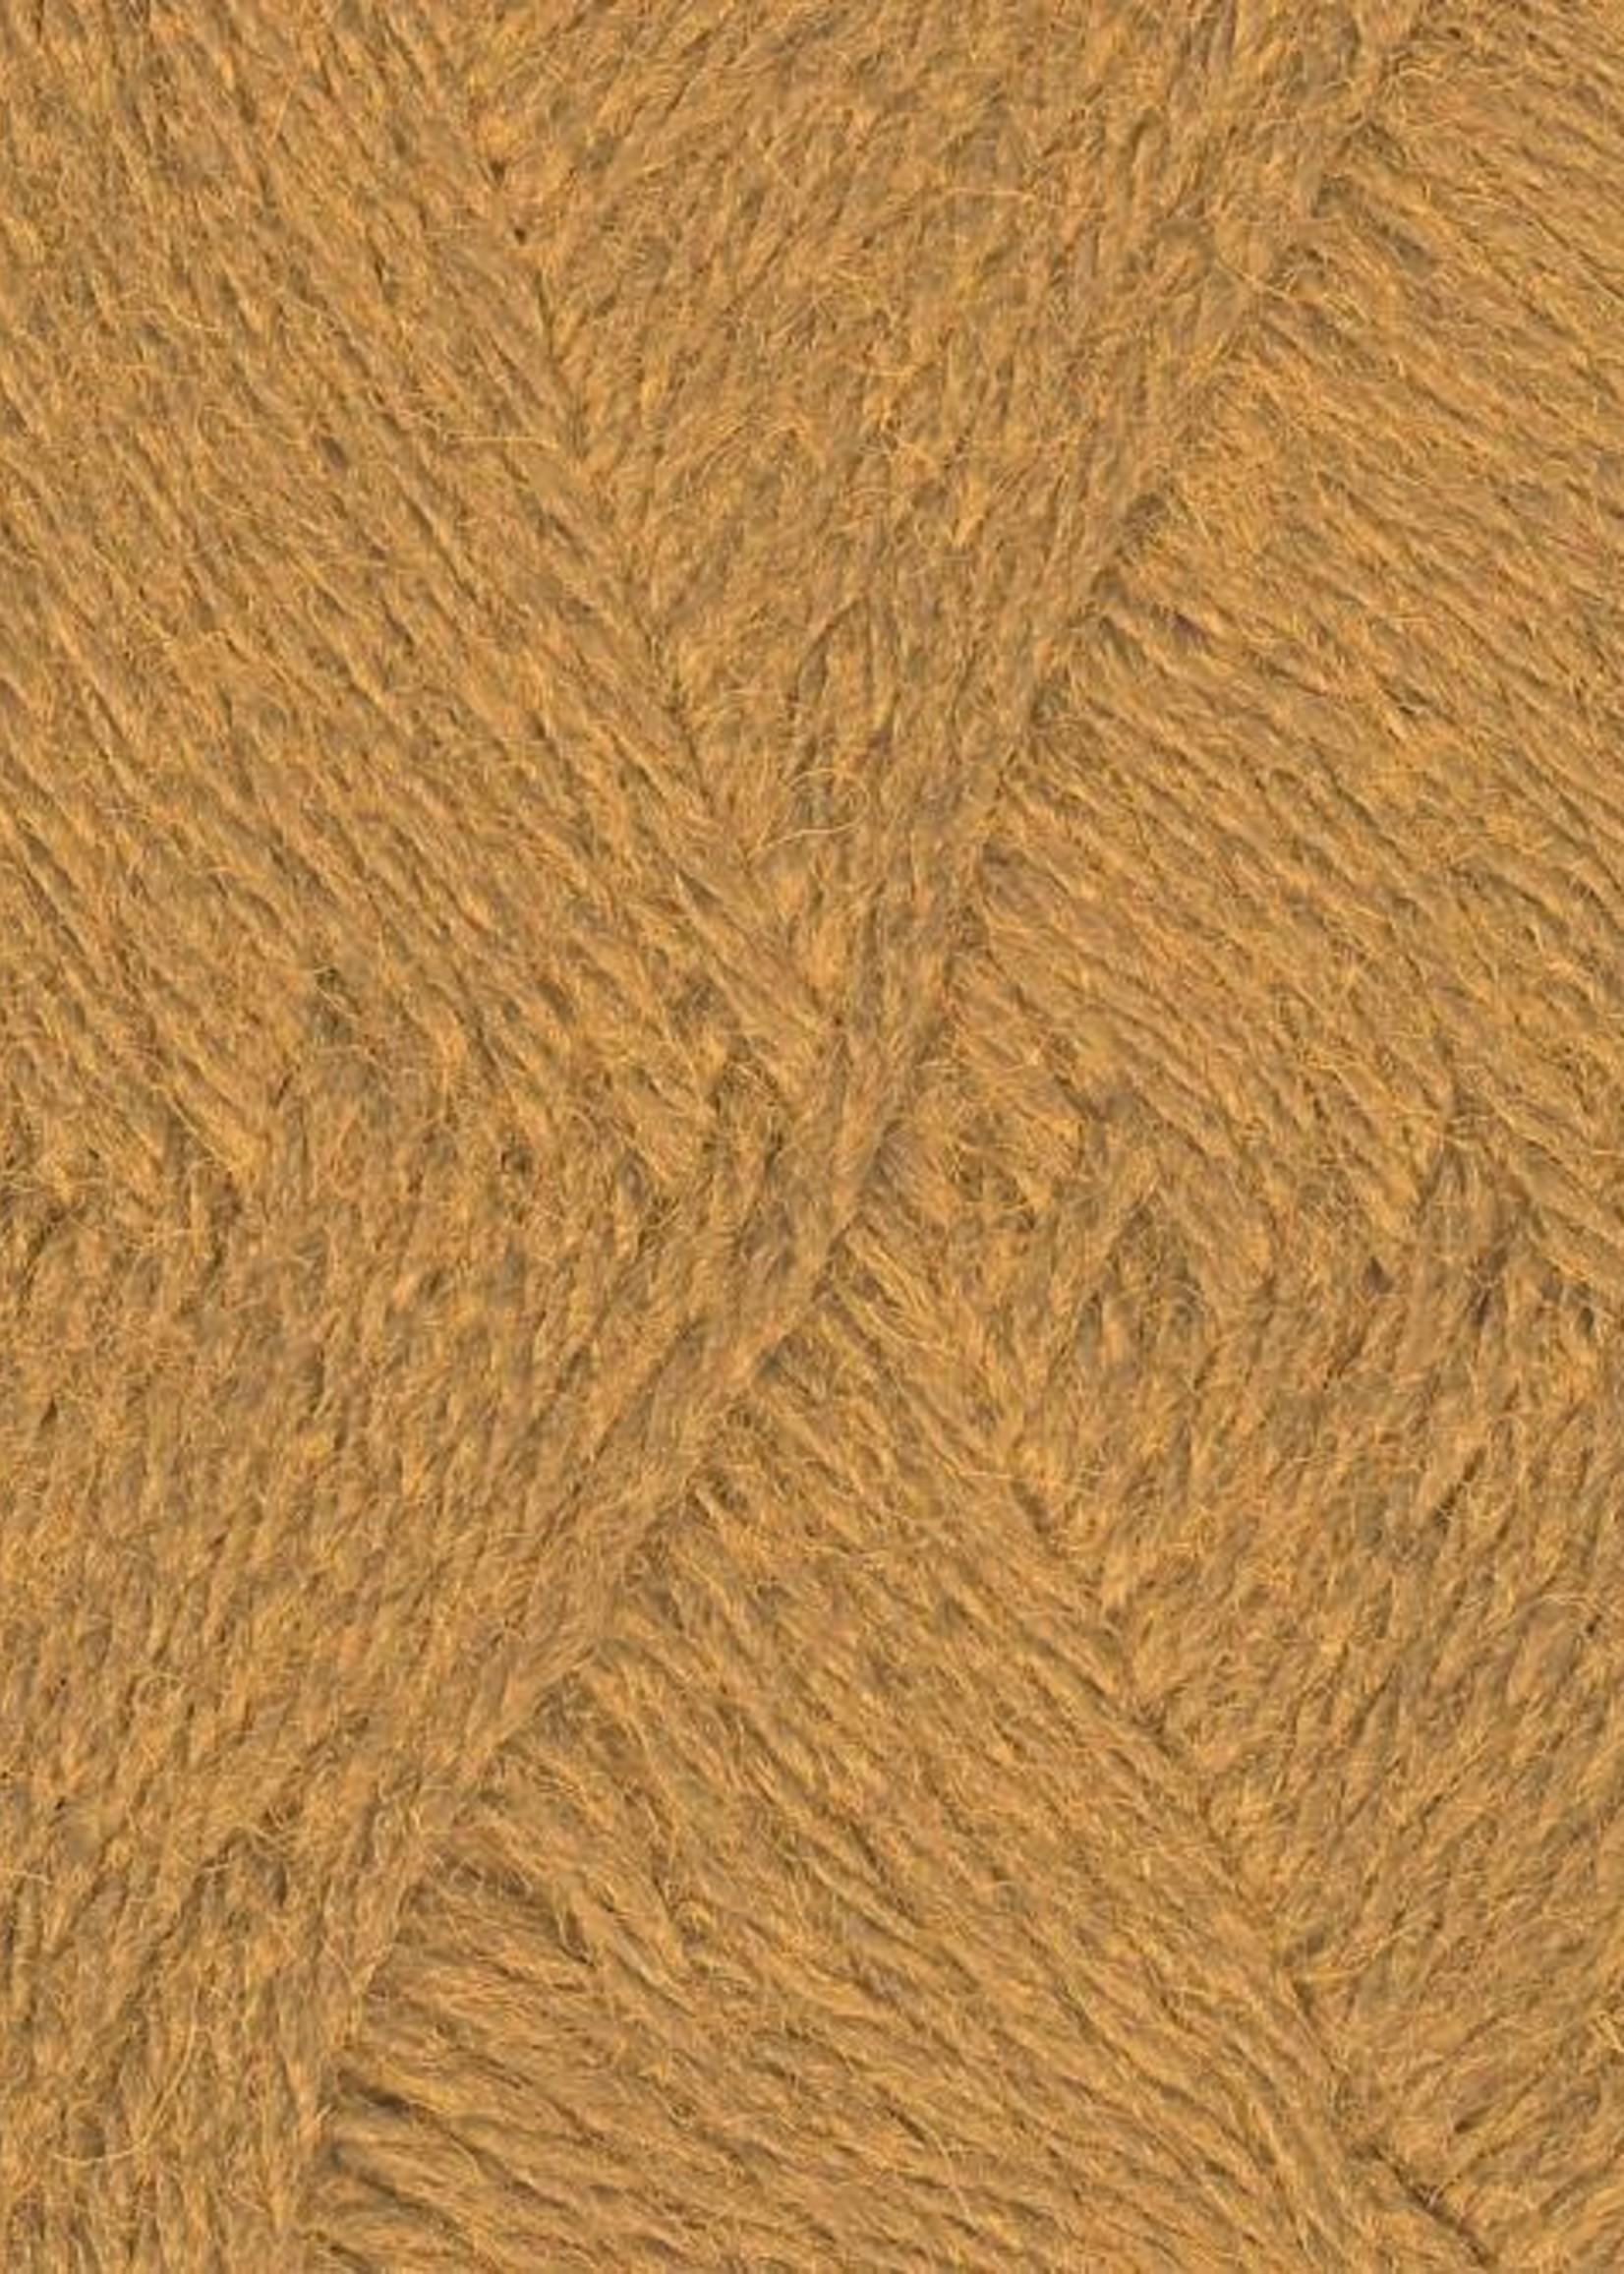 Knitting Fever KFI Collection Teenie Weenie Wool - Sand